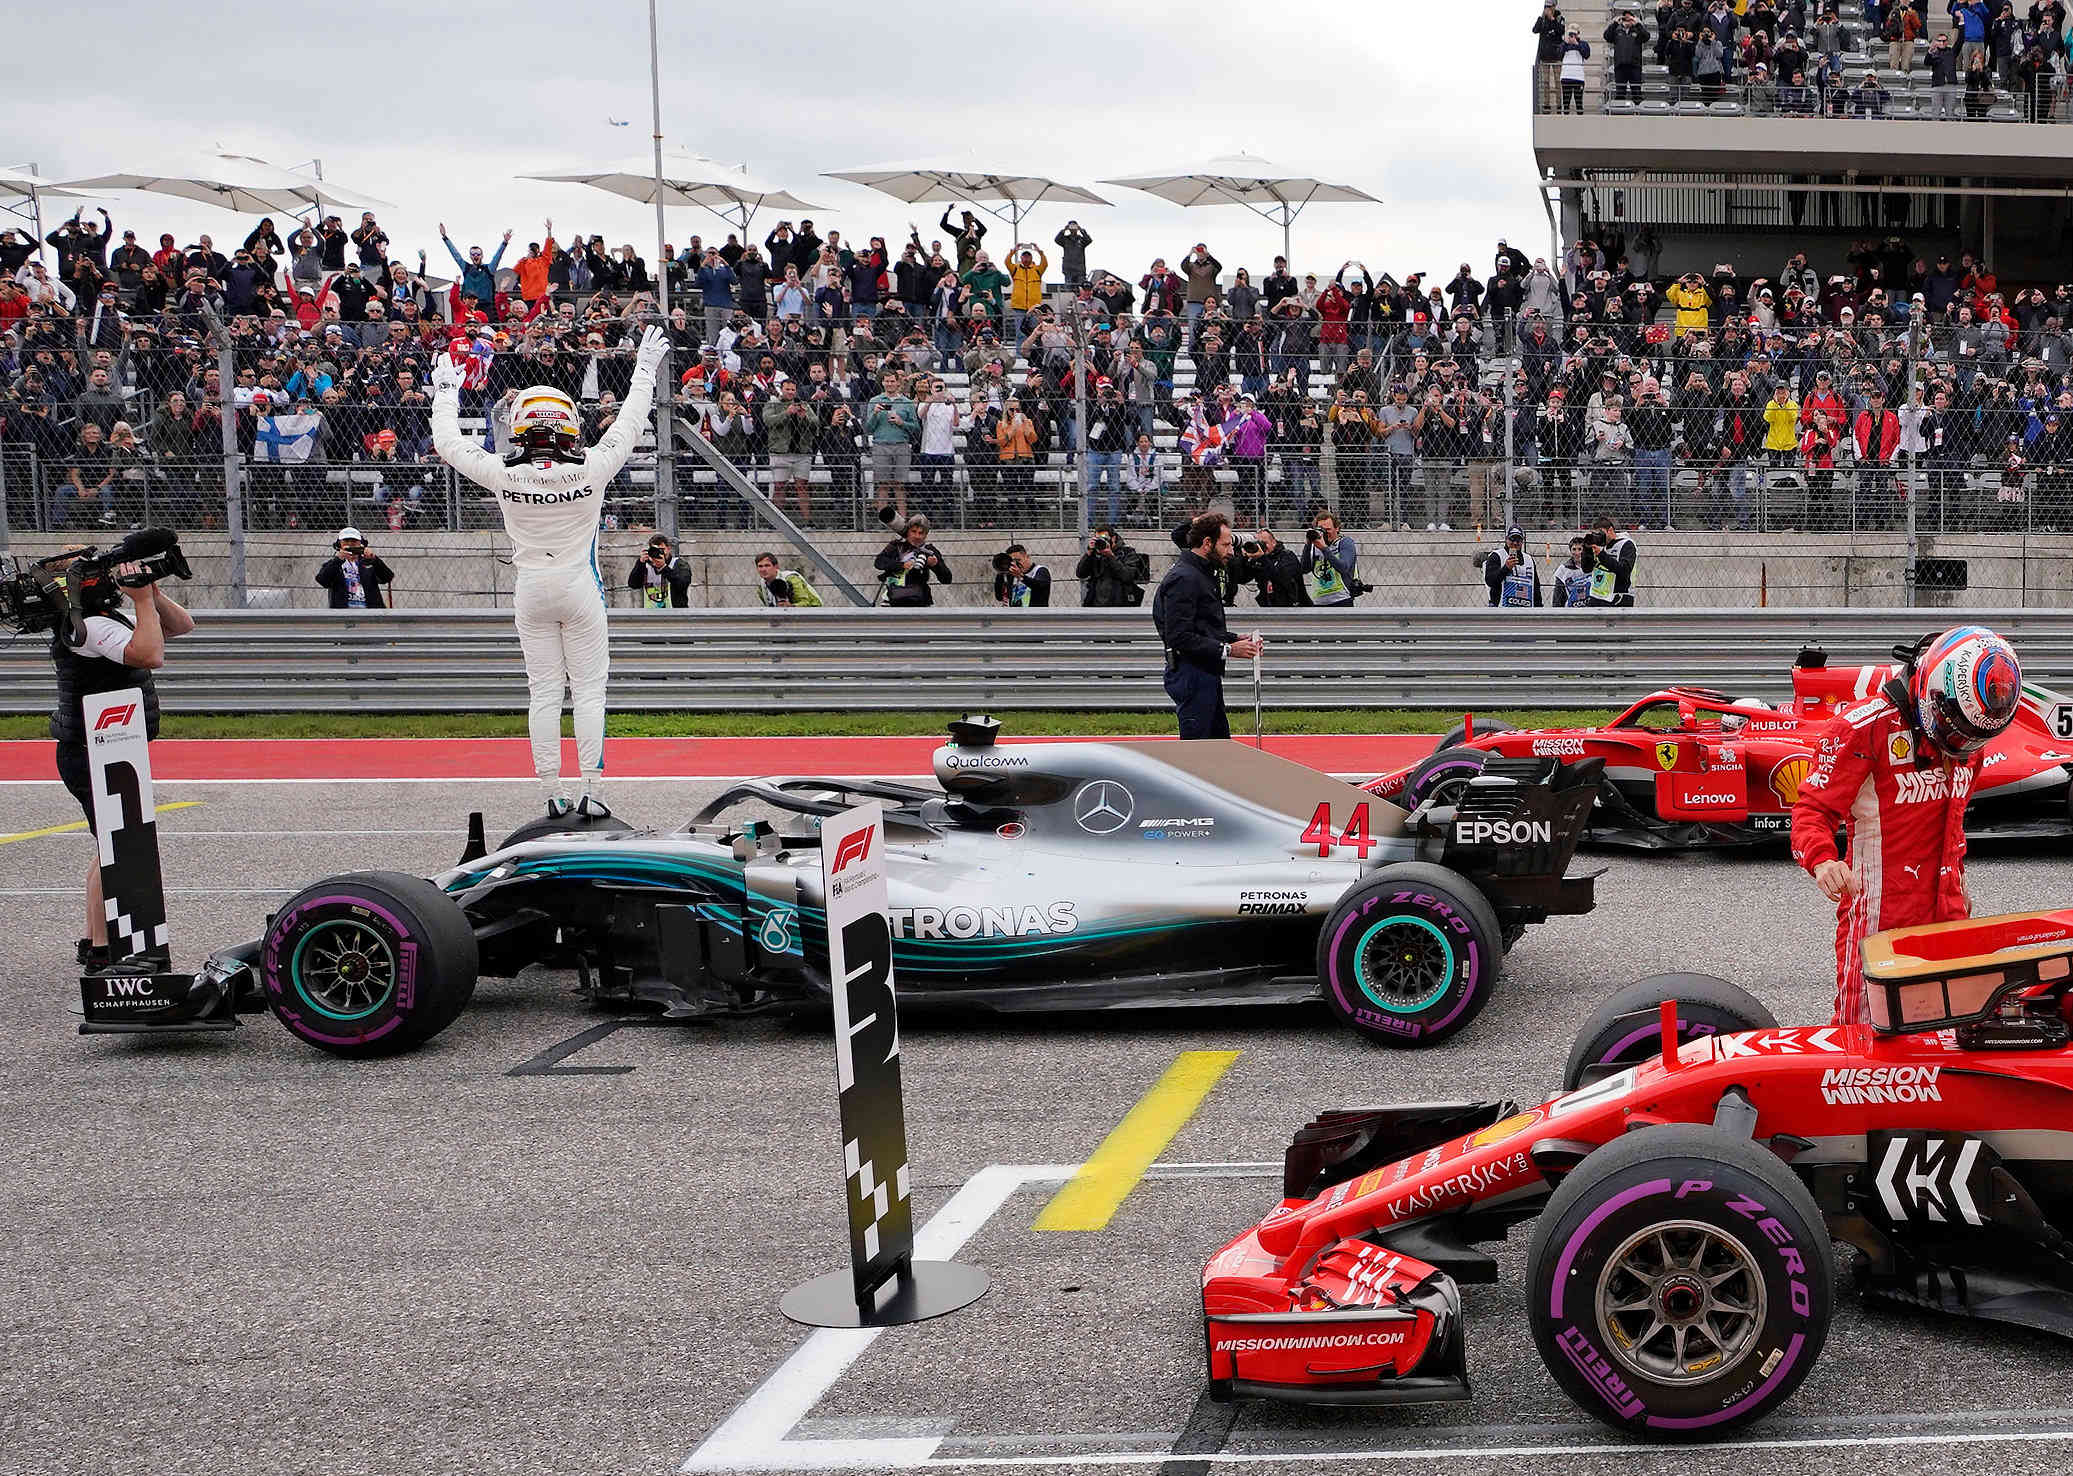 Formel 1 Großer Preis Der Usa 2018 Das Qualifying Formel 1